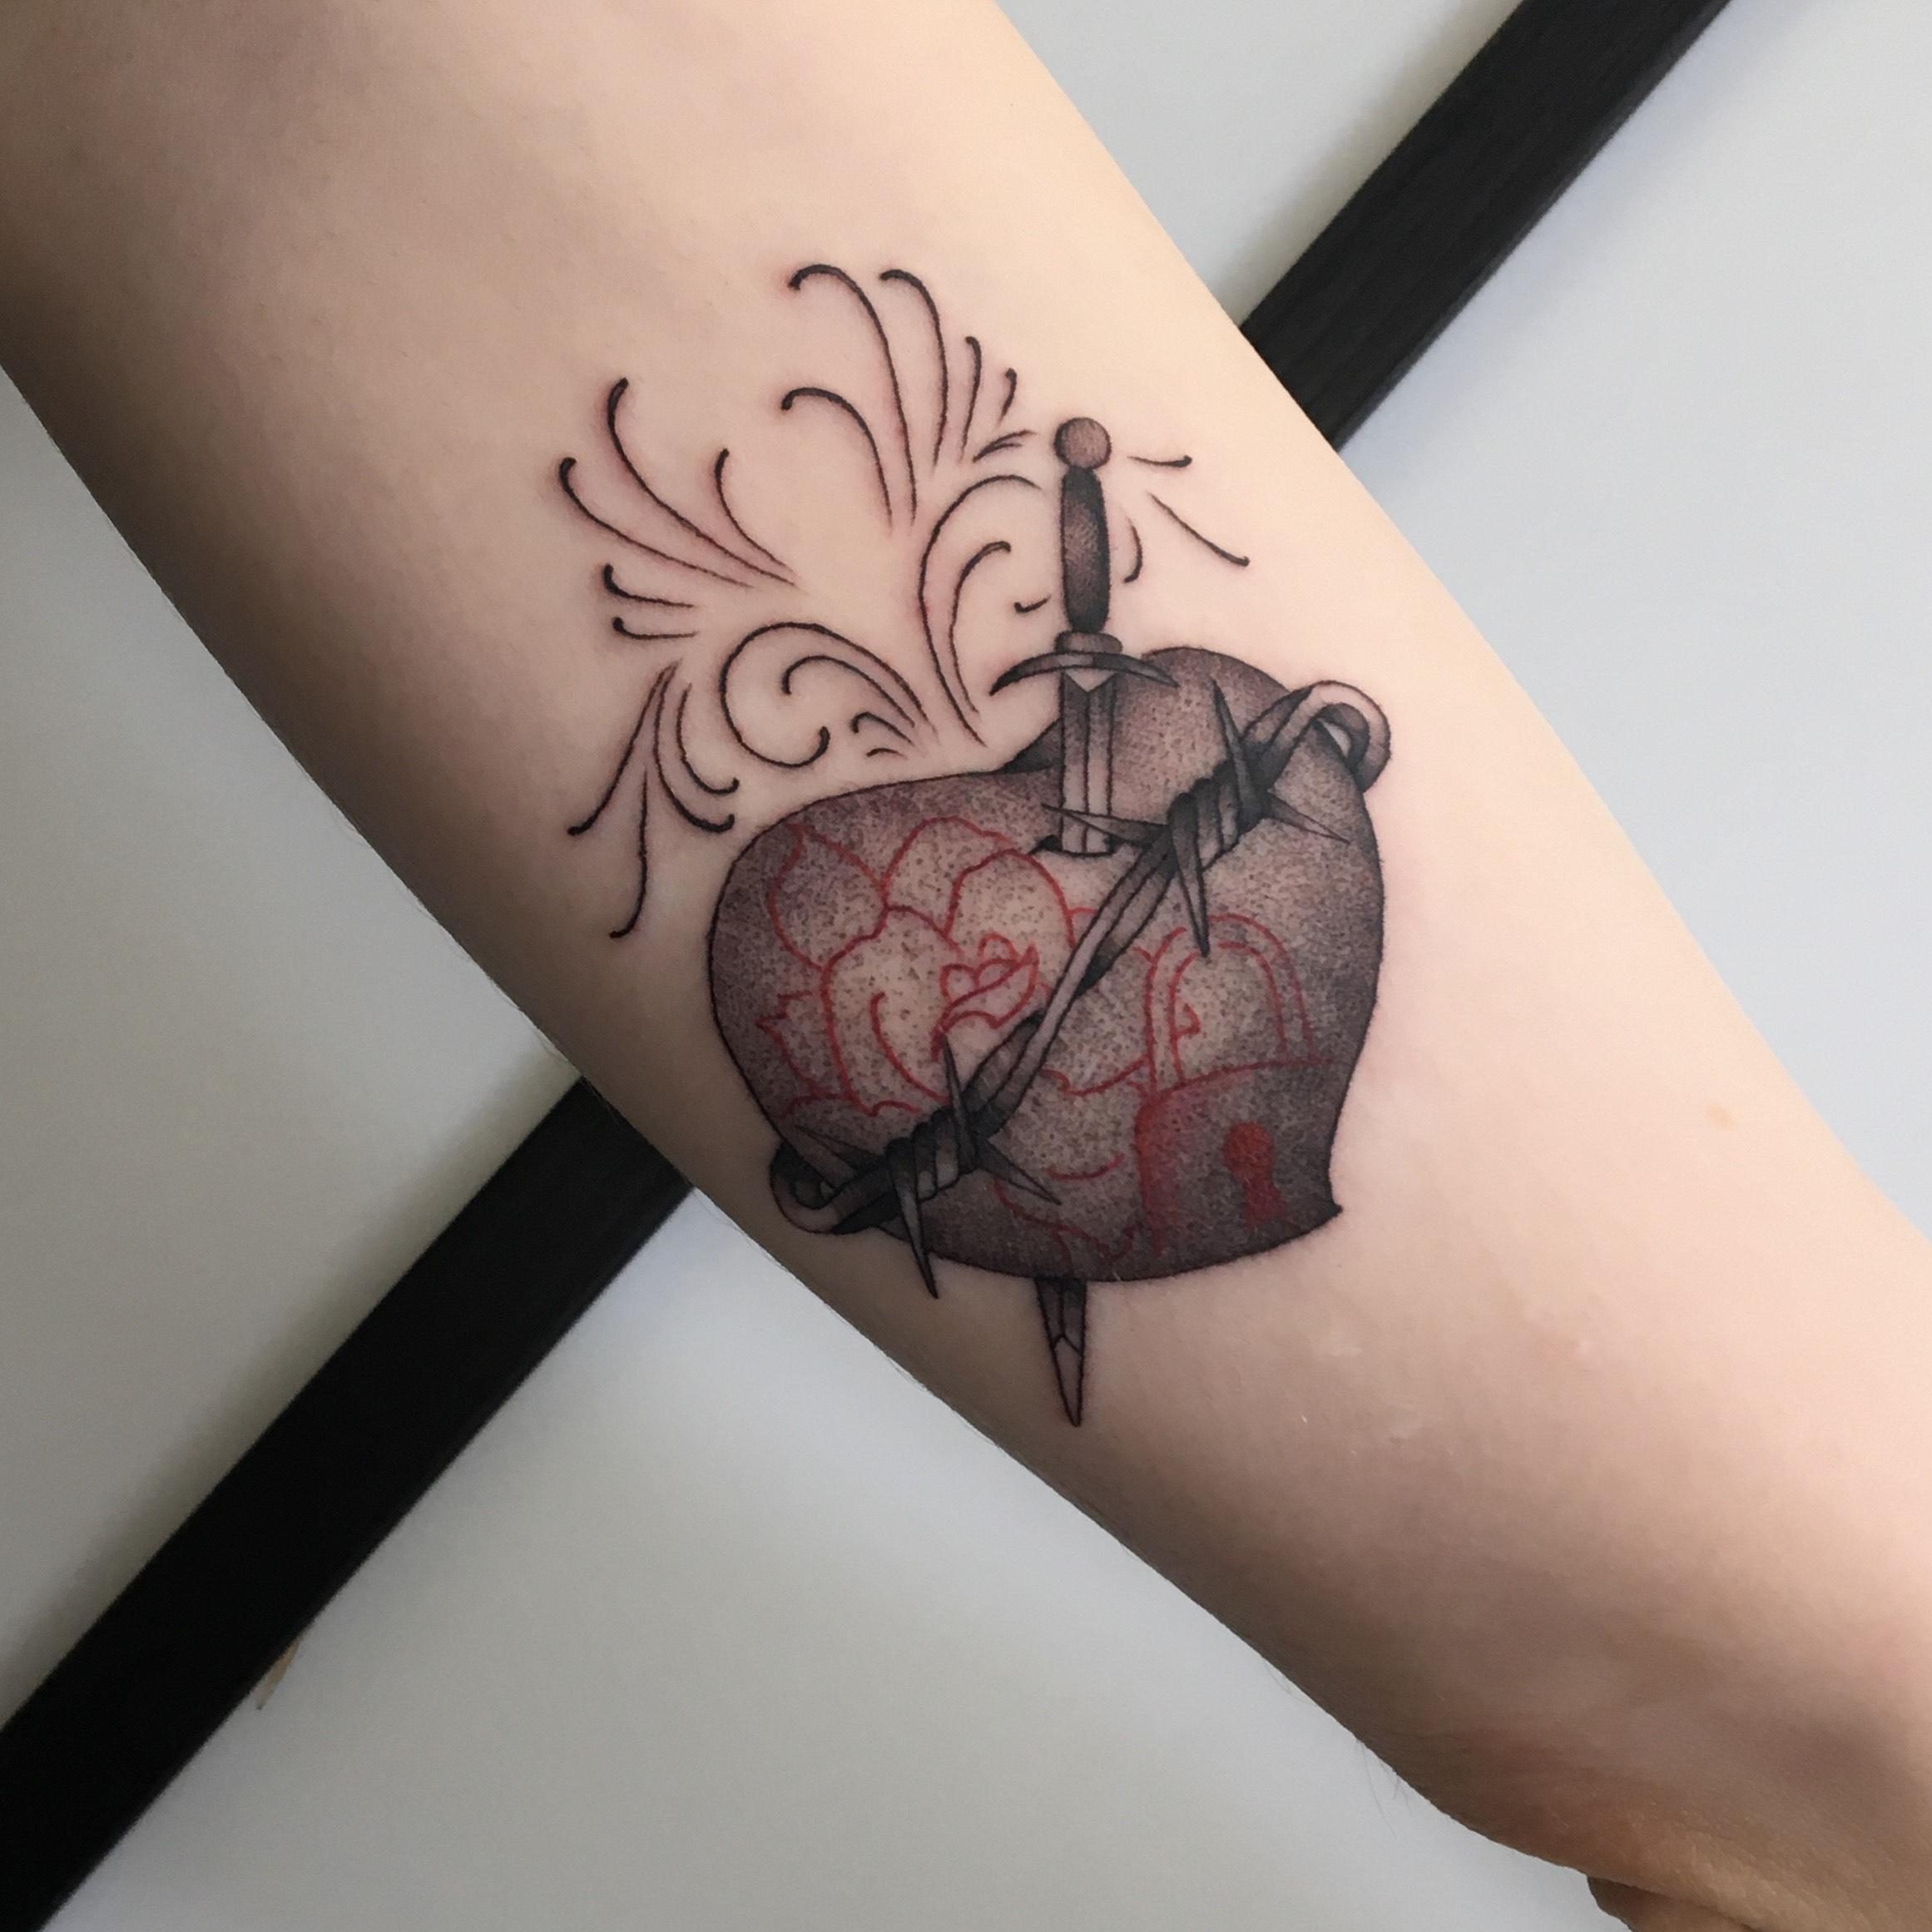 maxime-lamache-tattoo-angouleme-valere-tattoo-16